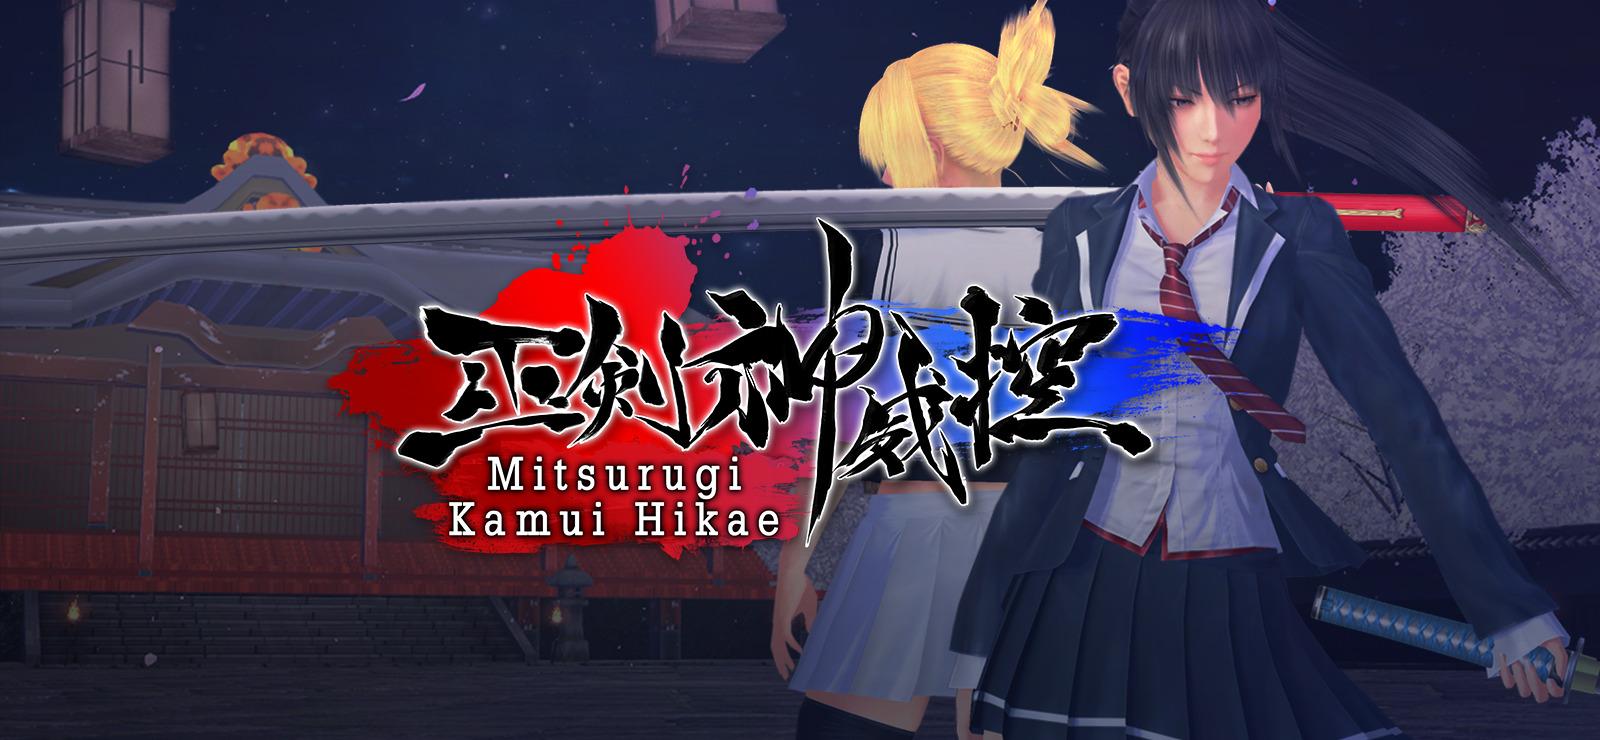 Image result for Mitsurugi Kamui Hikae